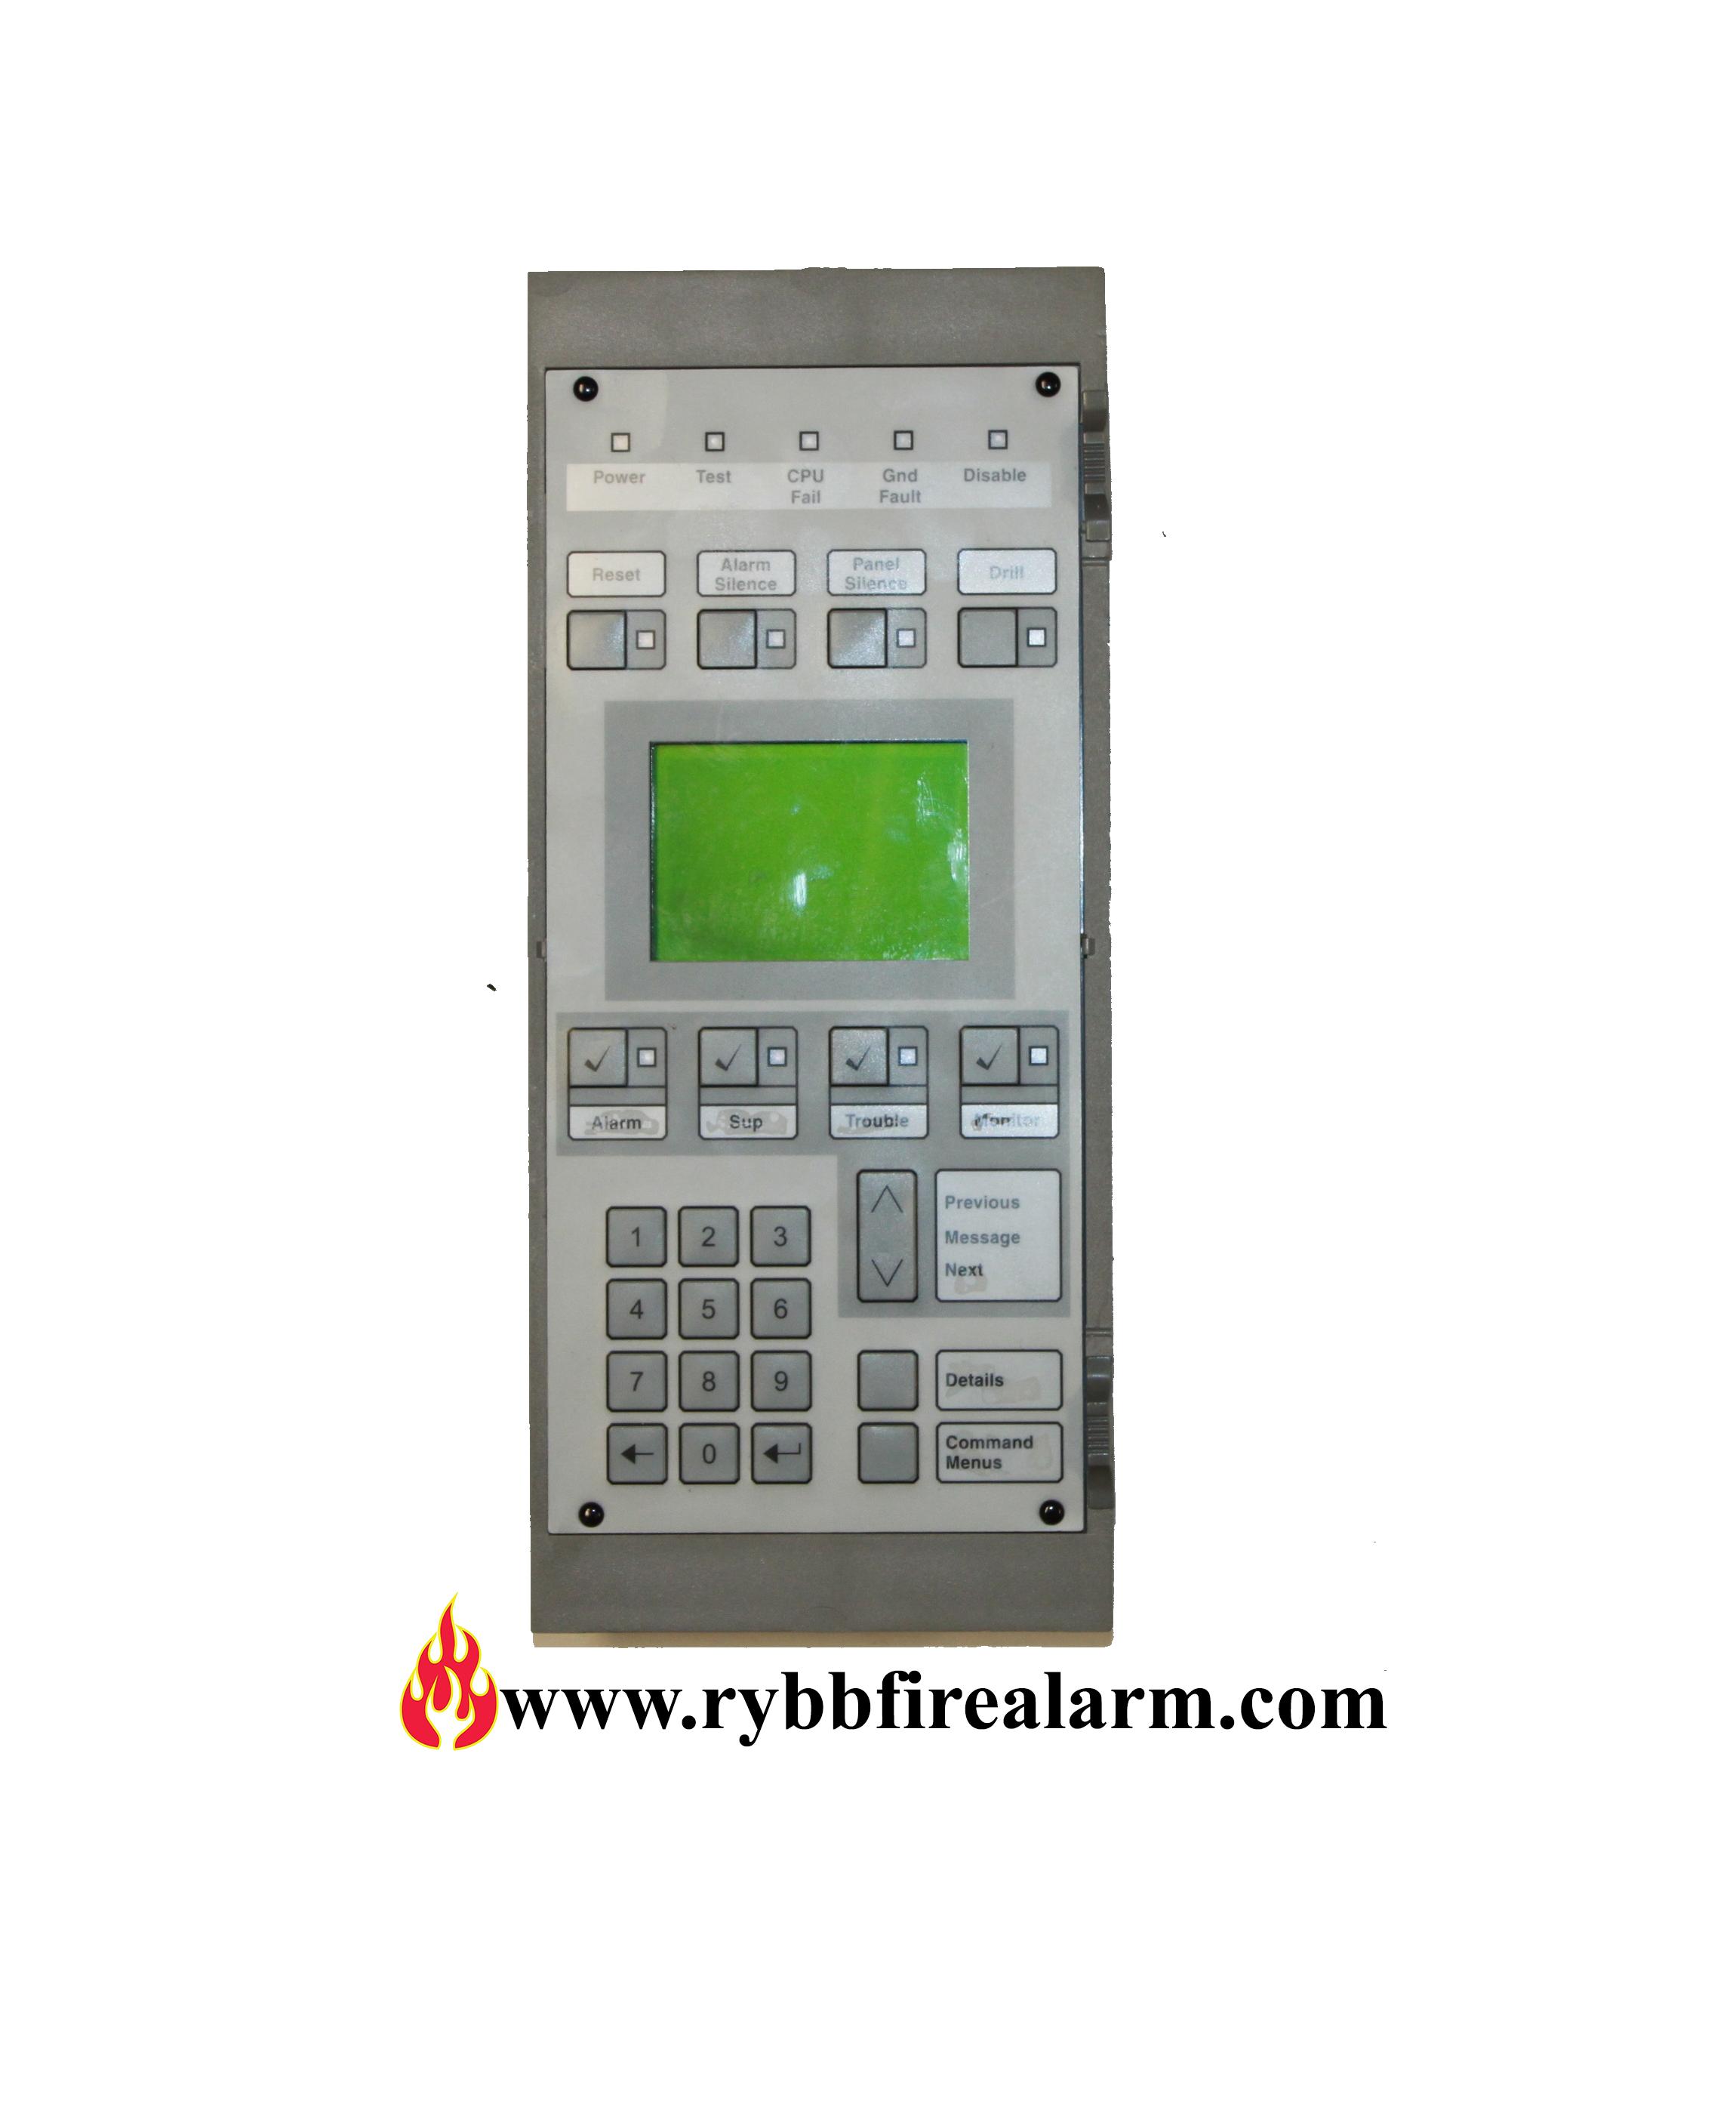 EST 3-CPU3 FIRE ALARM CONTROL PANEL – RYBB Fire Alarm Parts, Service ...